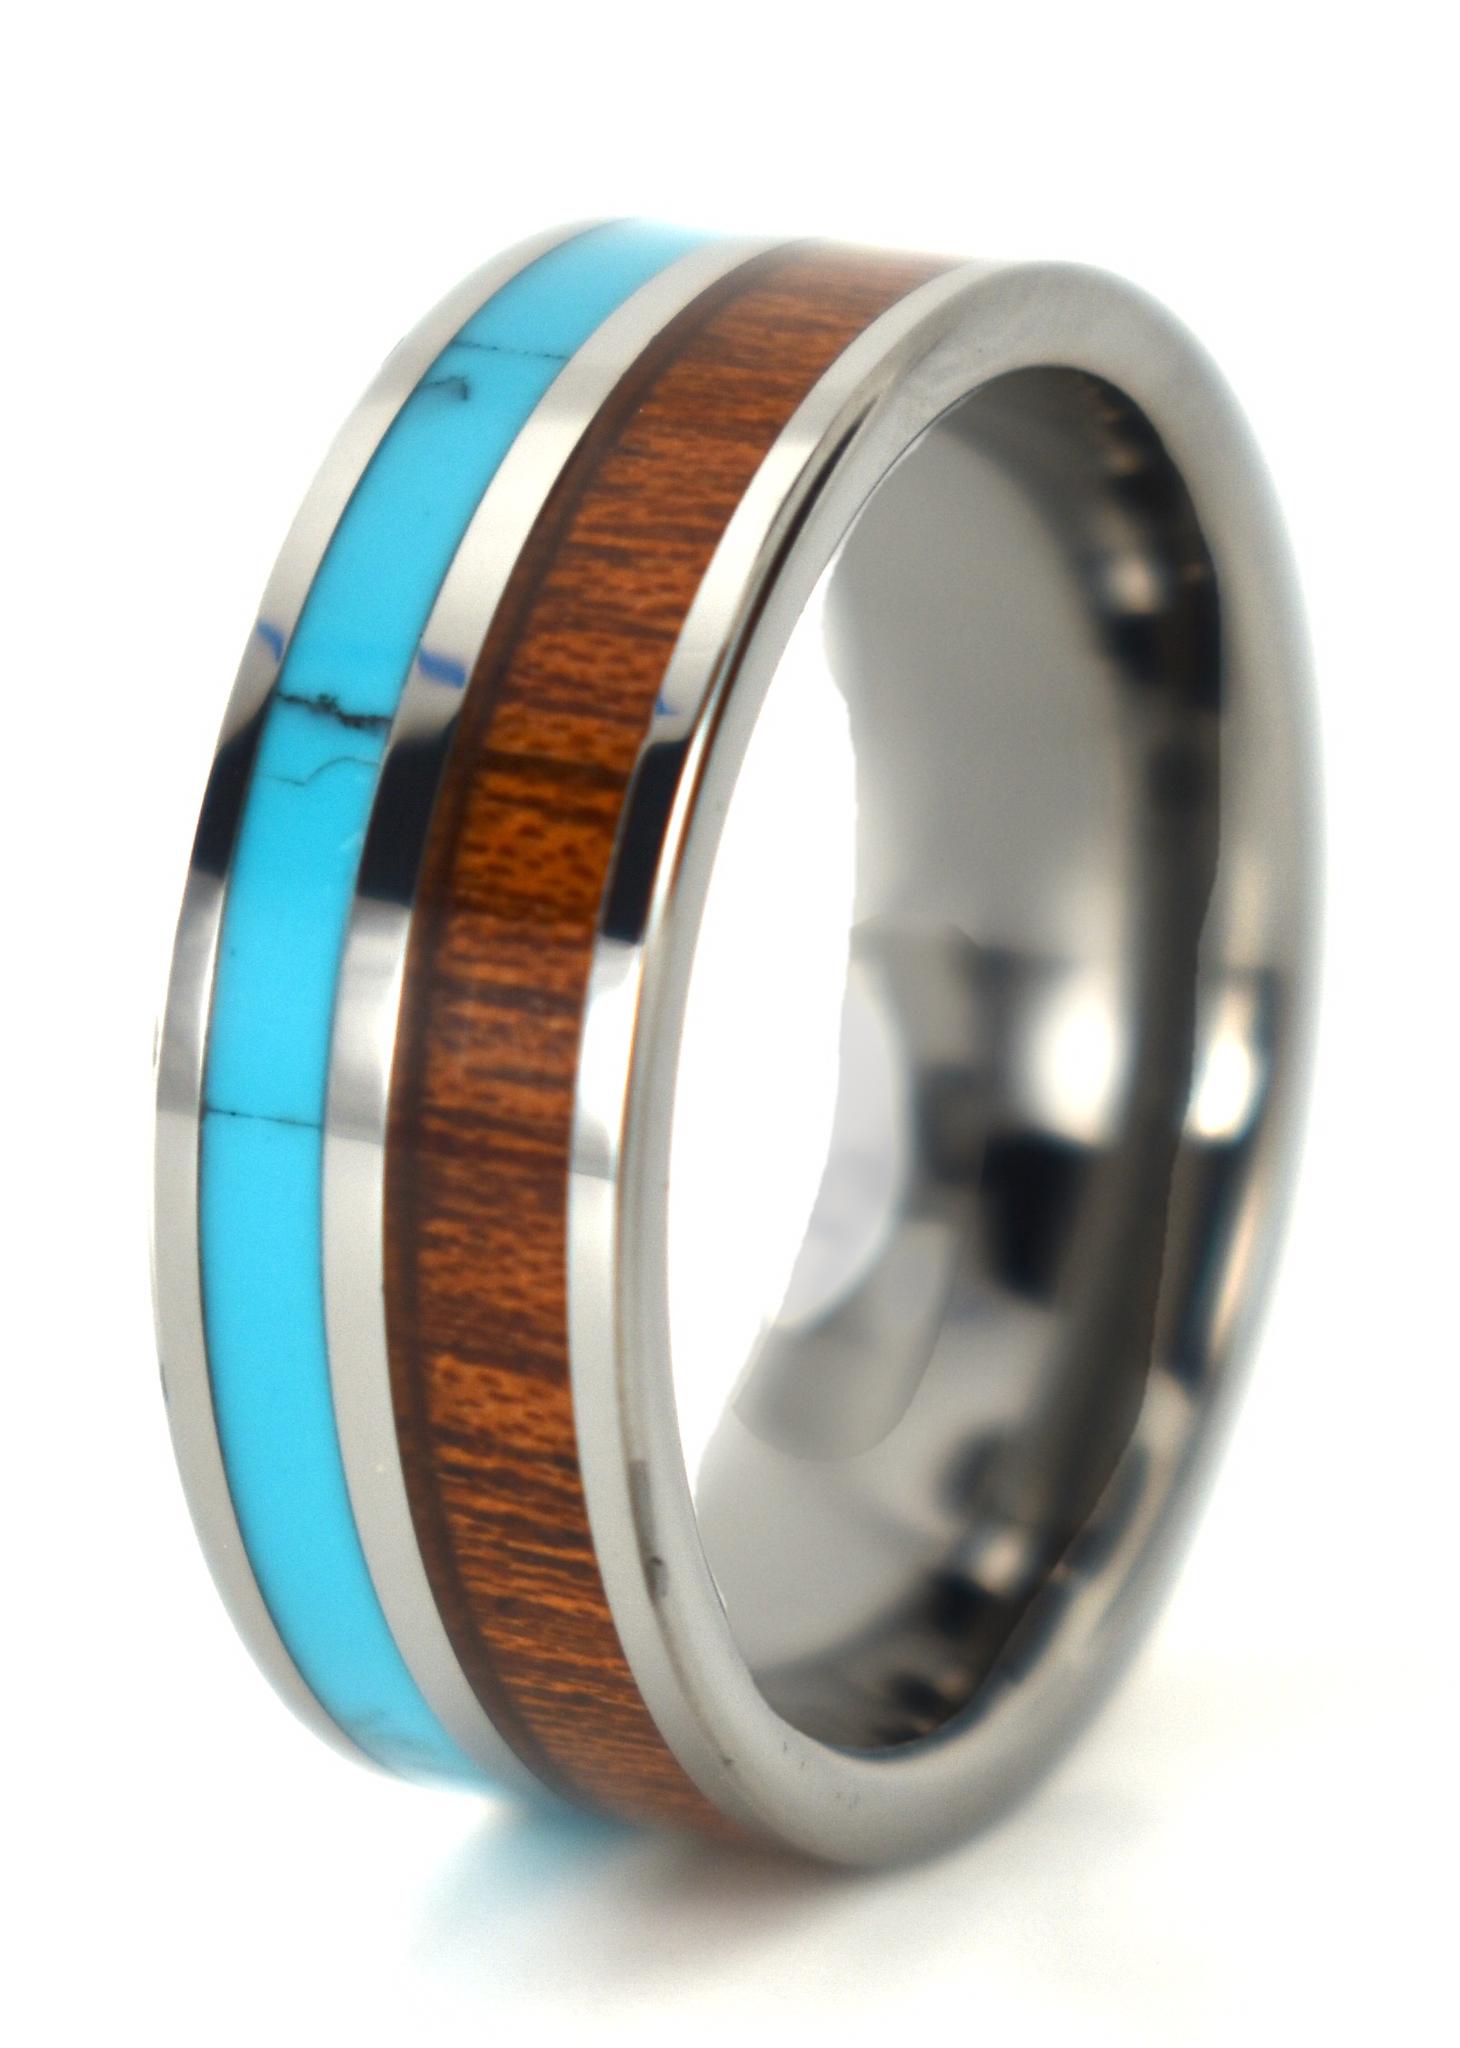 Zuni Wood Wedding ring designs, Mens wedding rings, Ruby